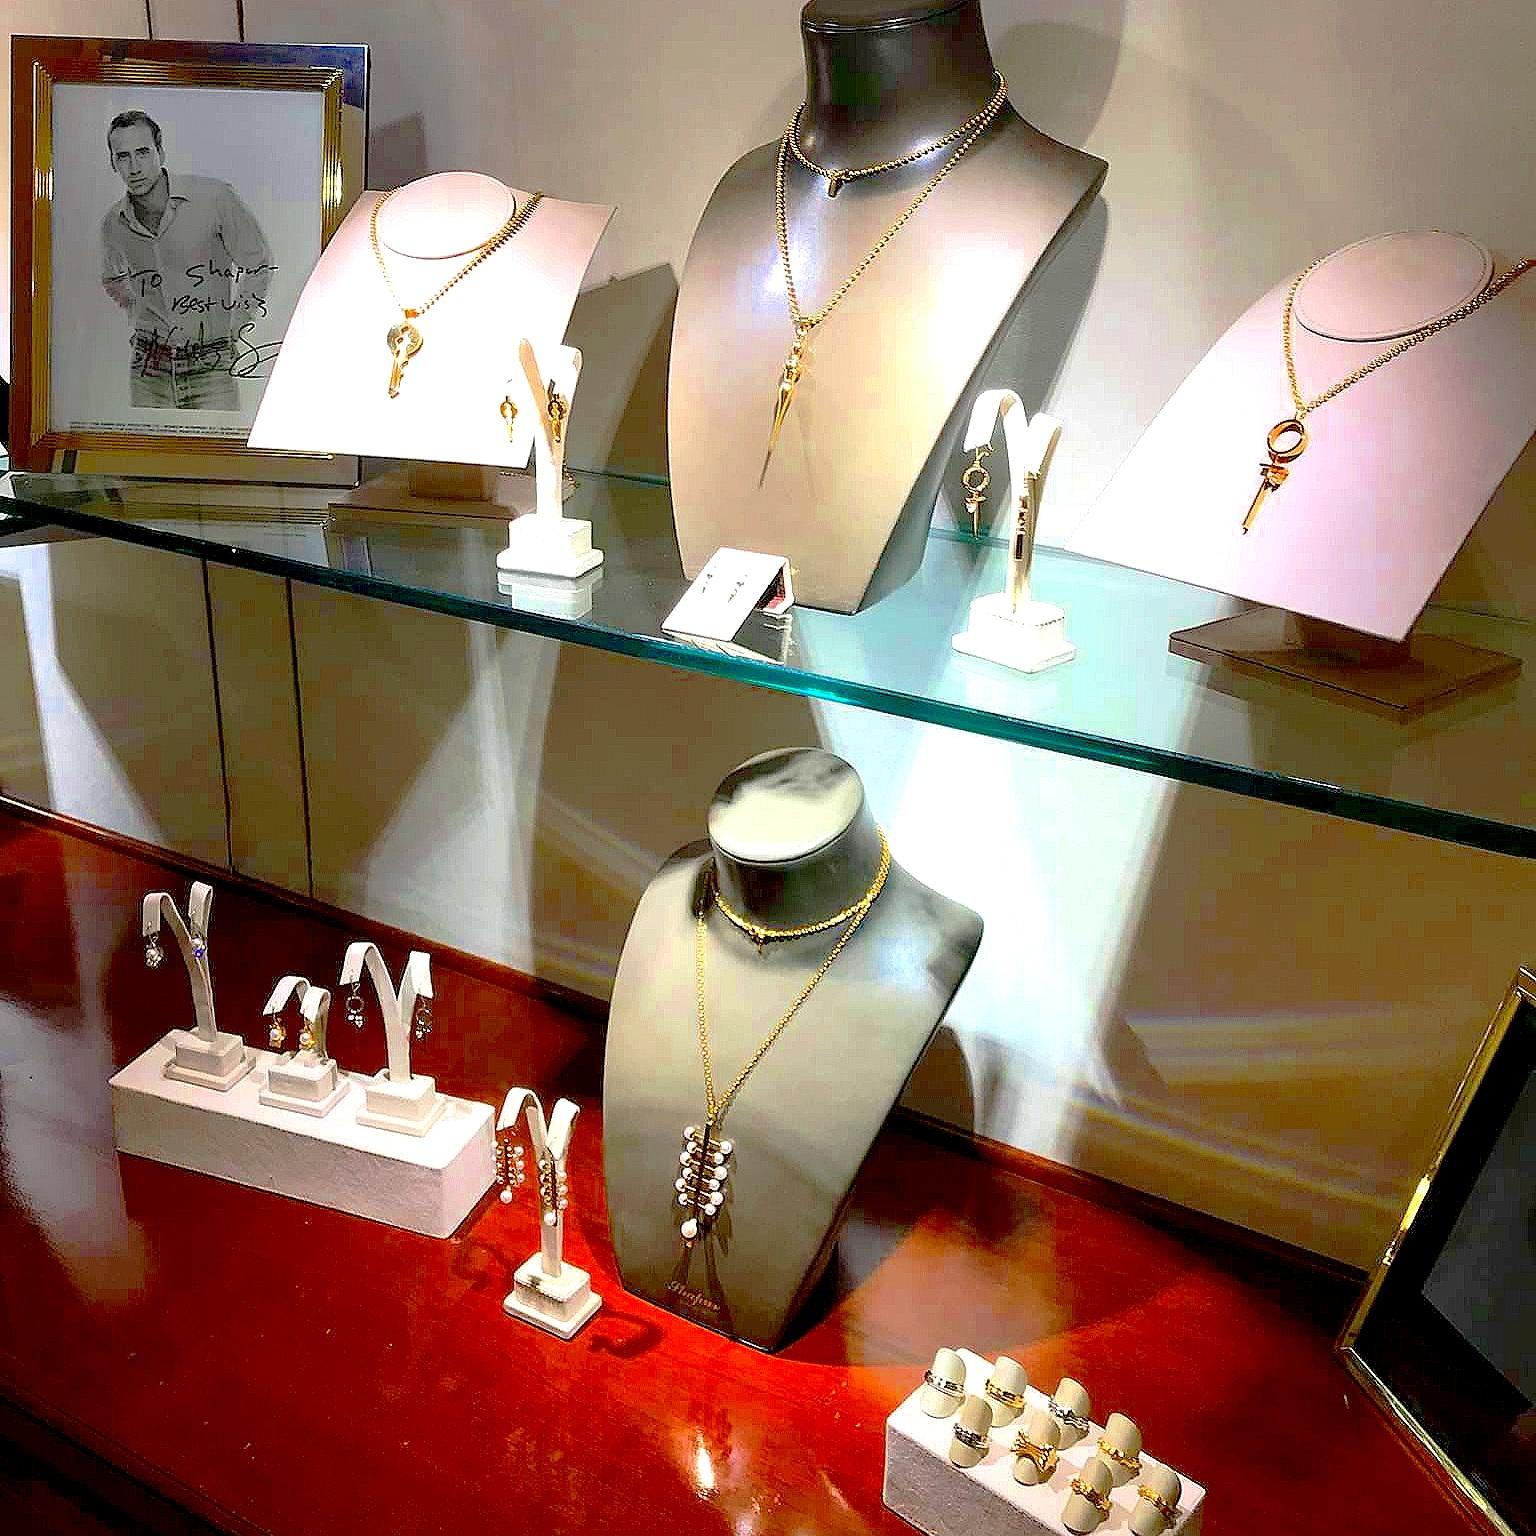 @Shapur - Shapur Mozaffarian Fine Jewelry272 Post StreetSan Francisco, CA